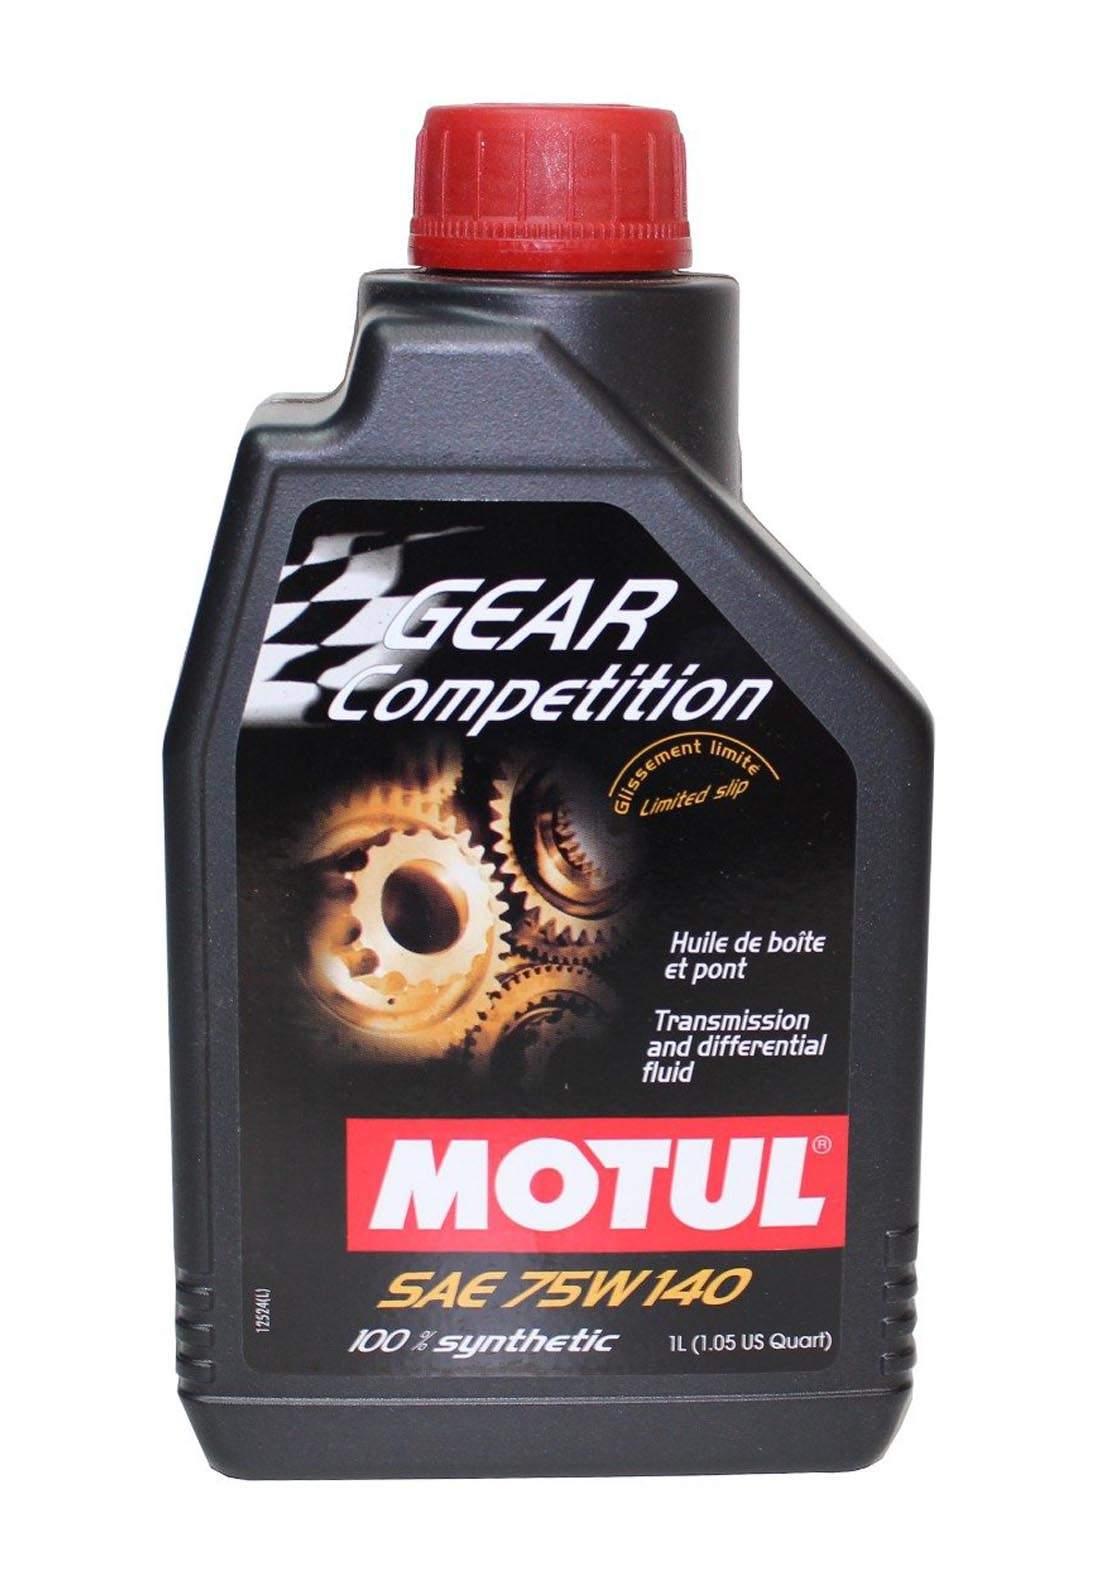 Motul 75w140 Gear Comptition  Gear oil 1 L زيت ناقل الحركة اليدوي